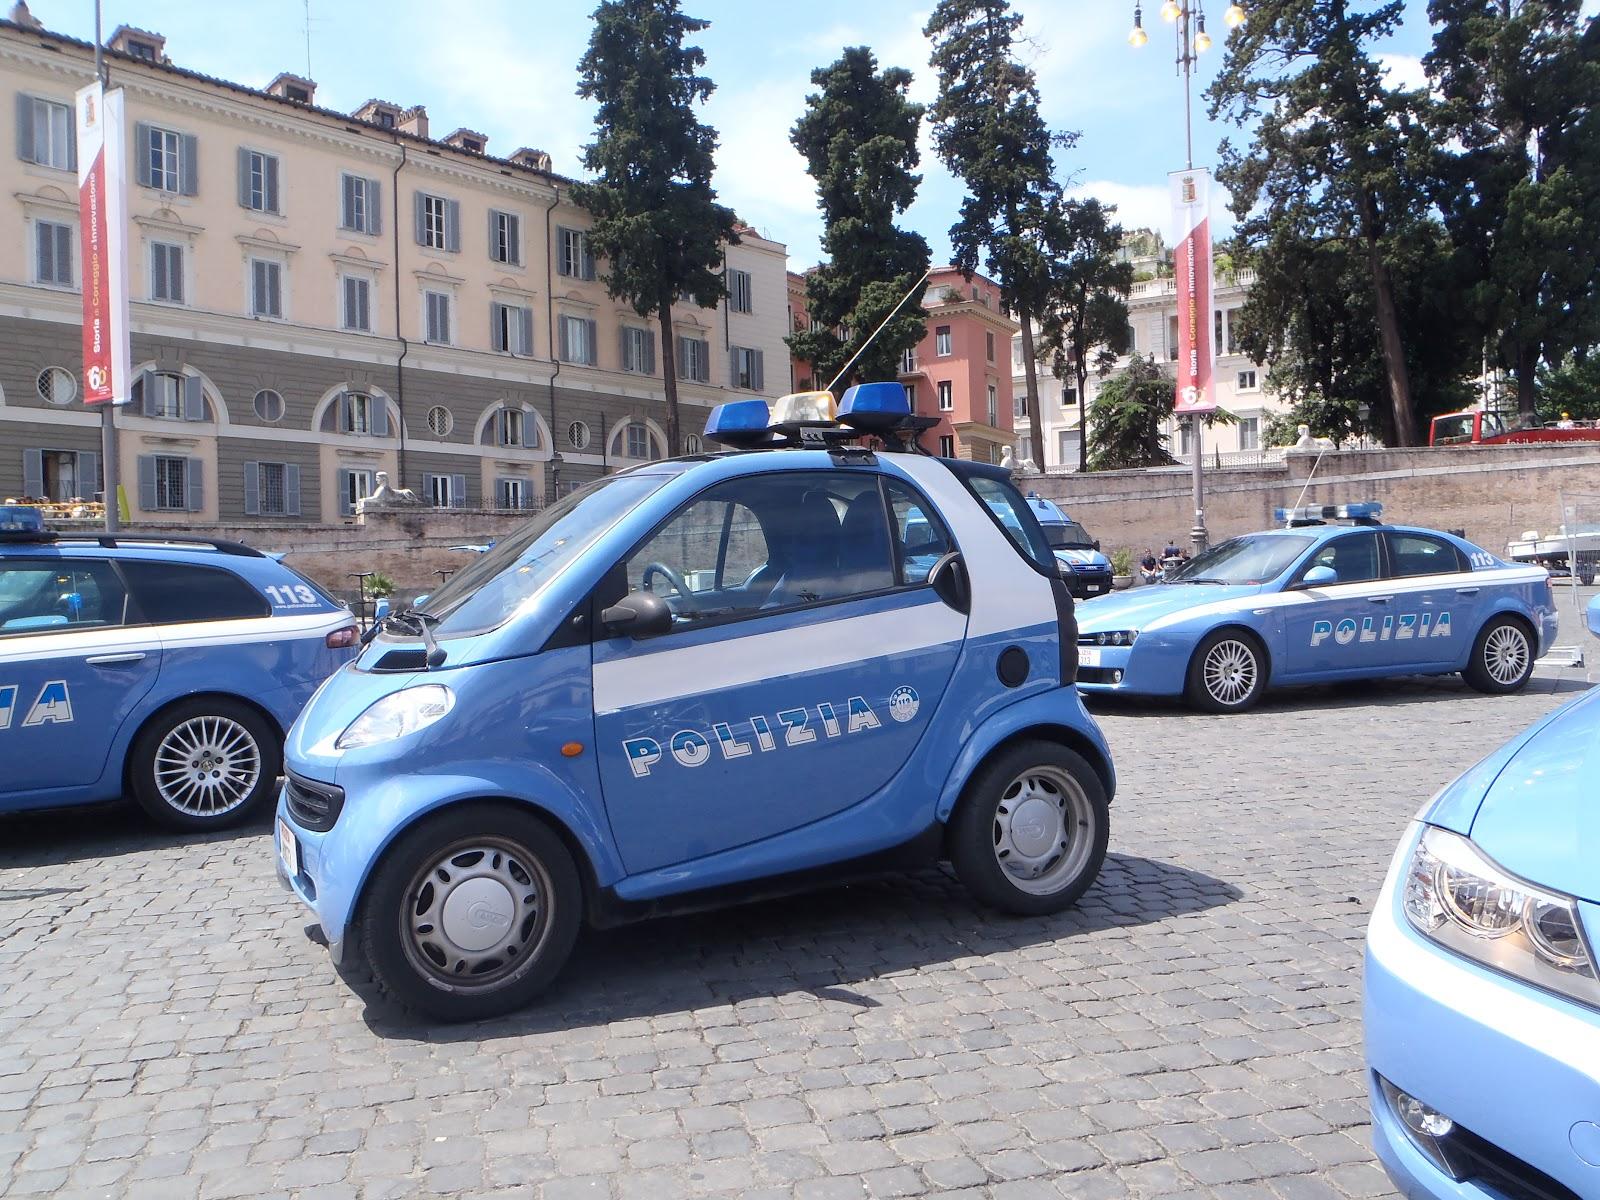 Italian+Smart+Police+car.JPG